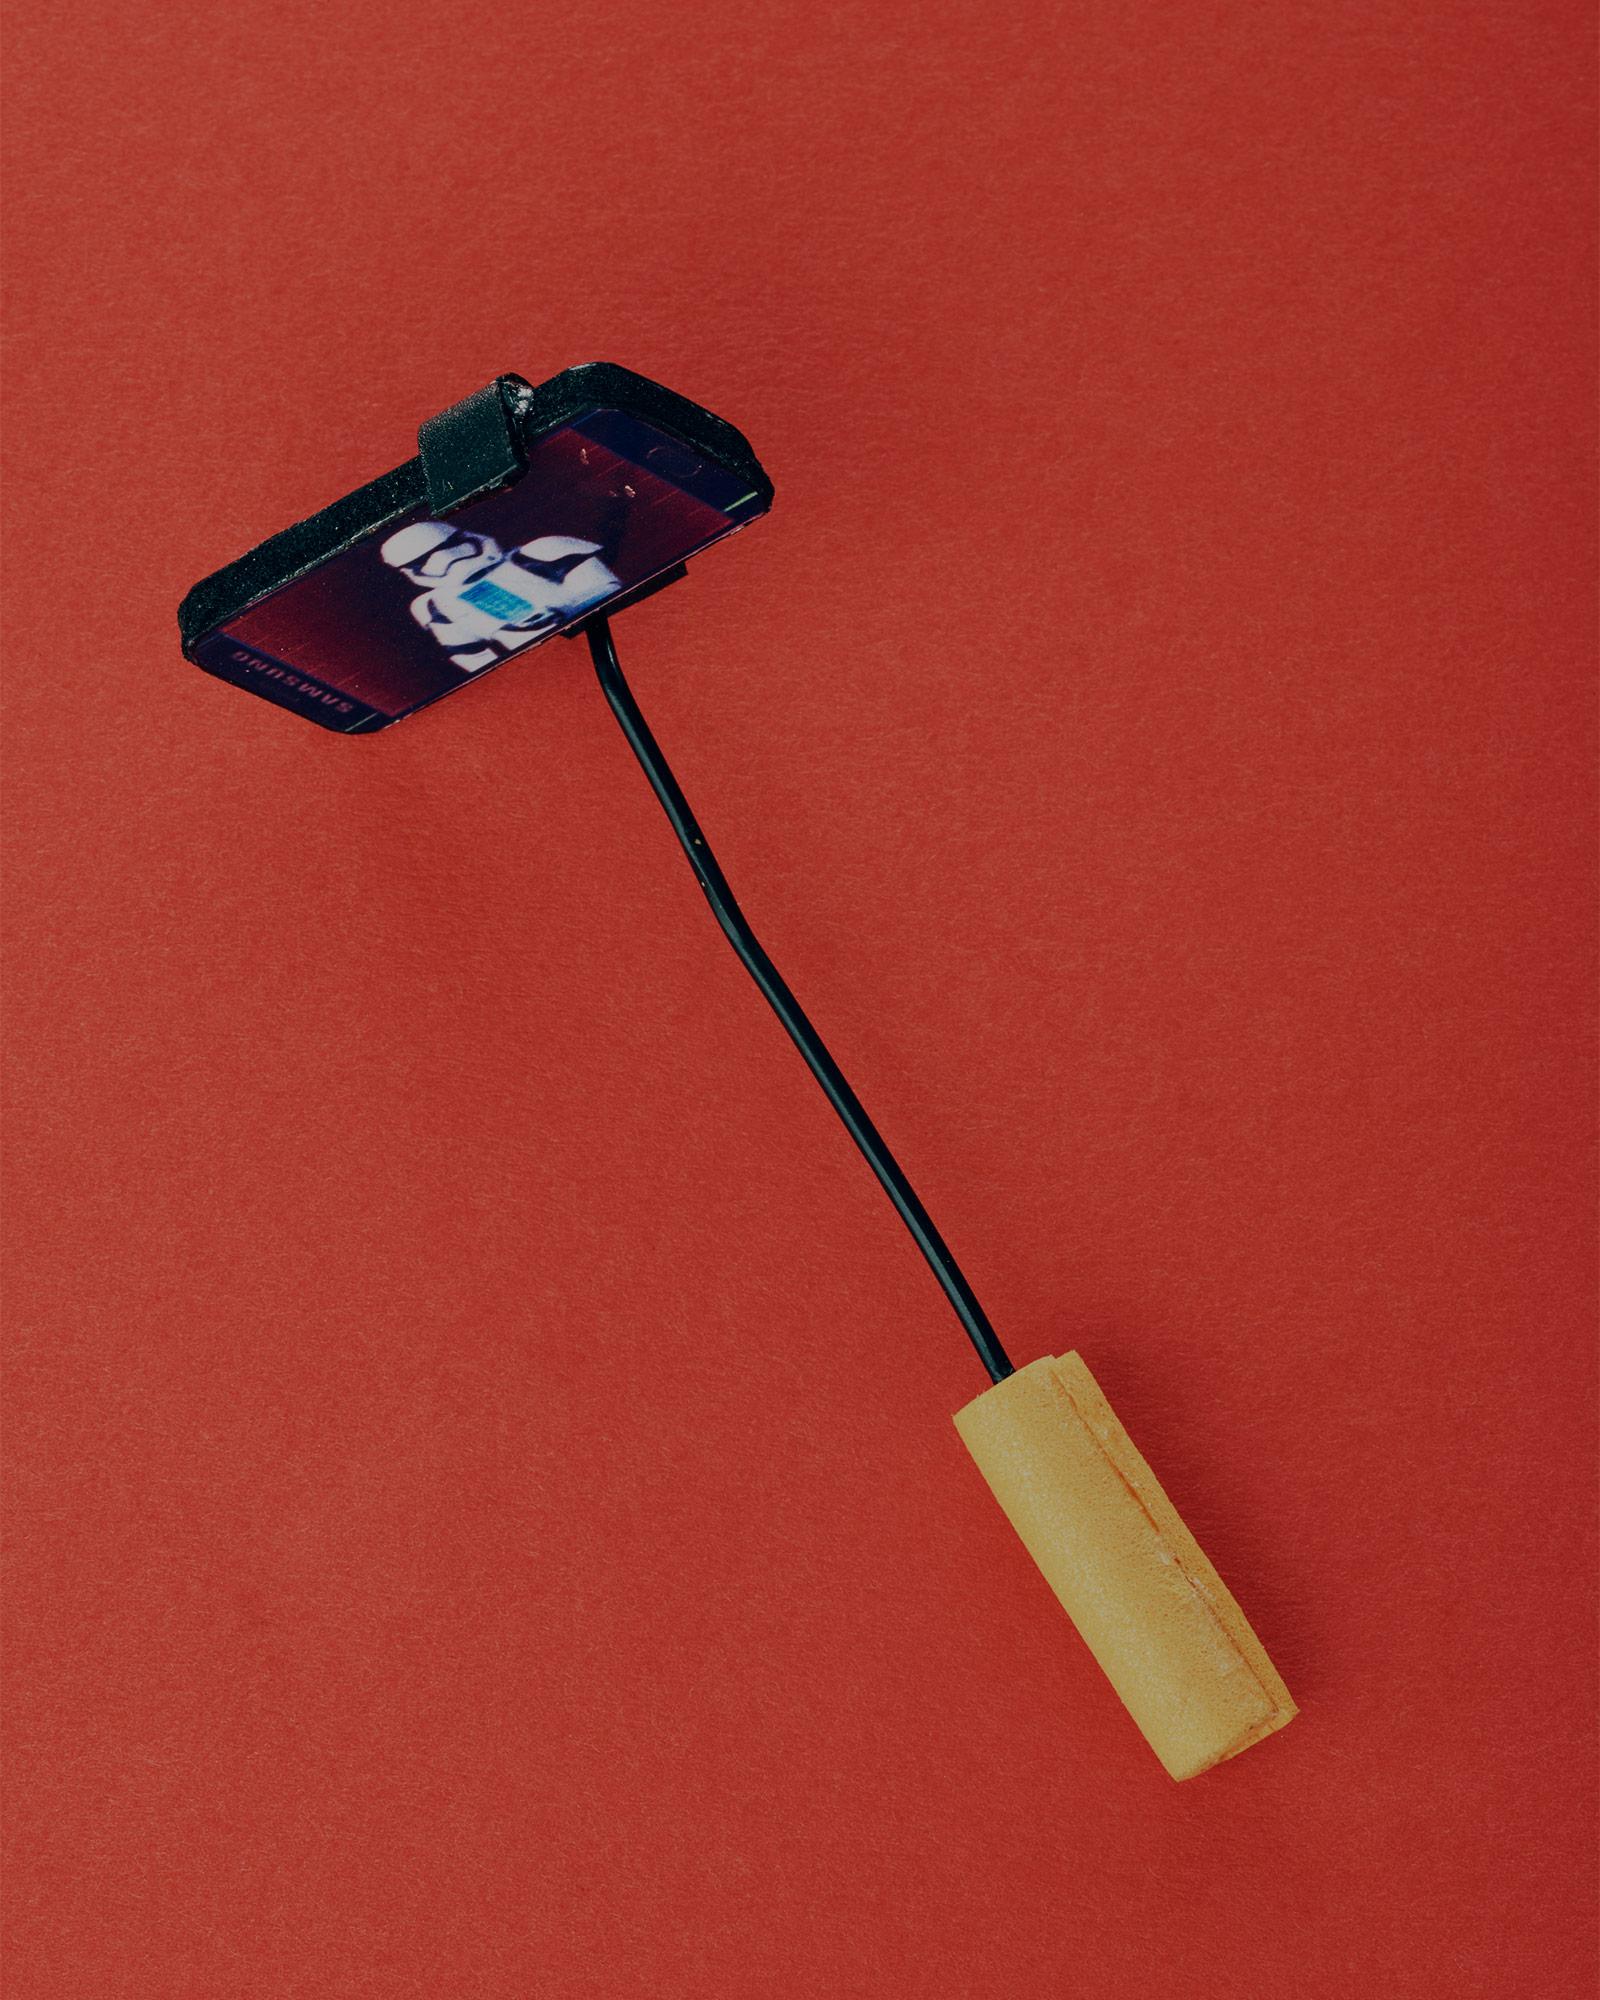 selfie stick toy